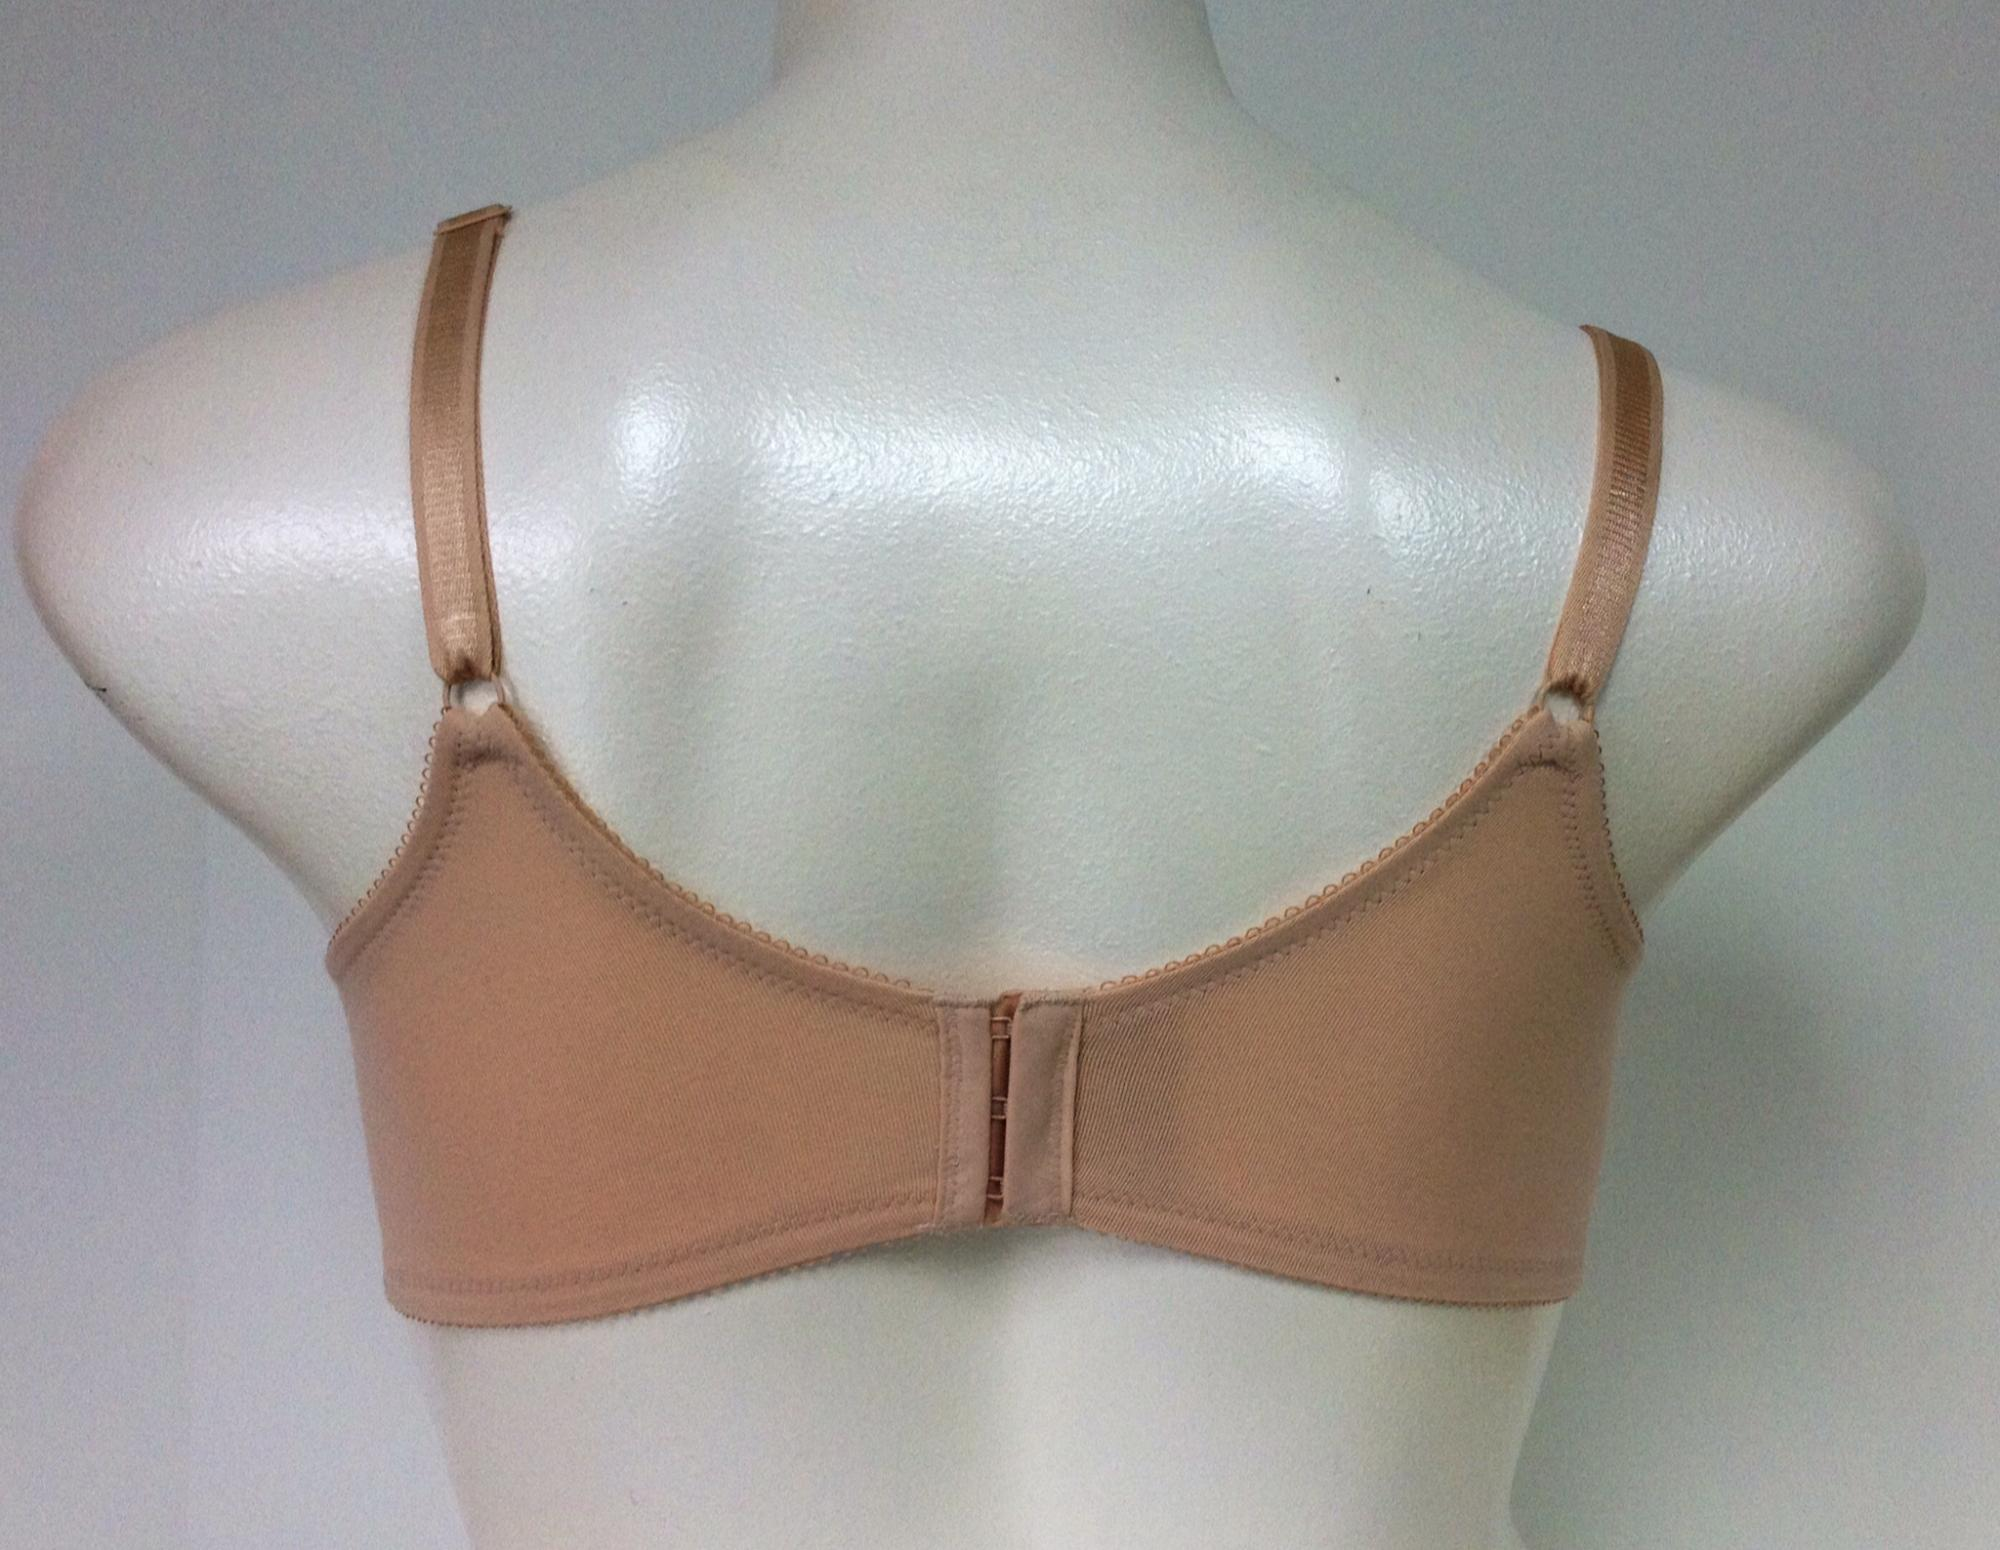 wacoal-underwire-nursing-bra-nude-back.jpg